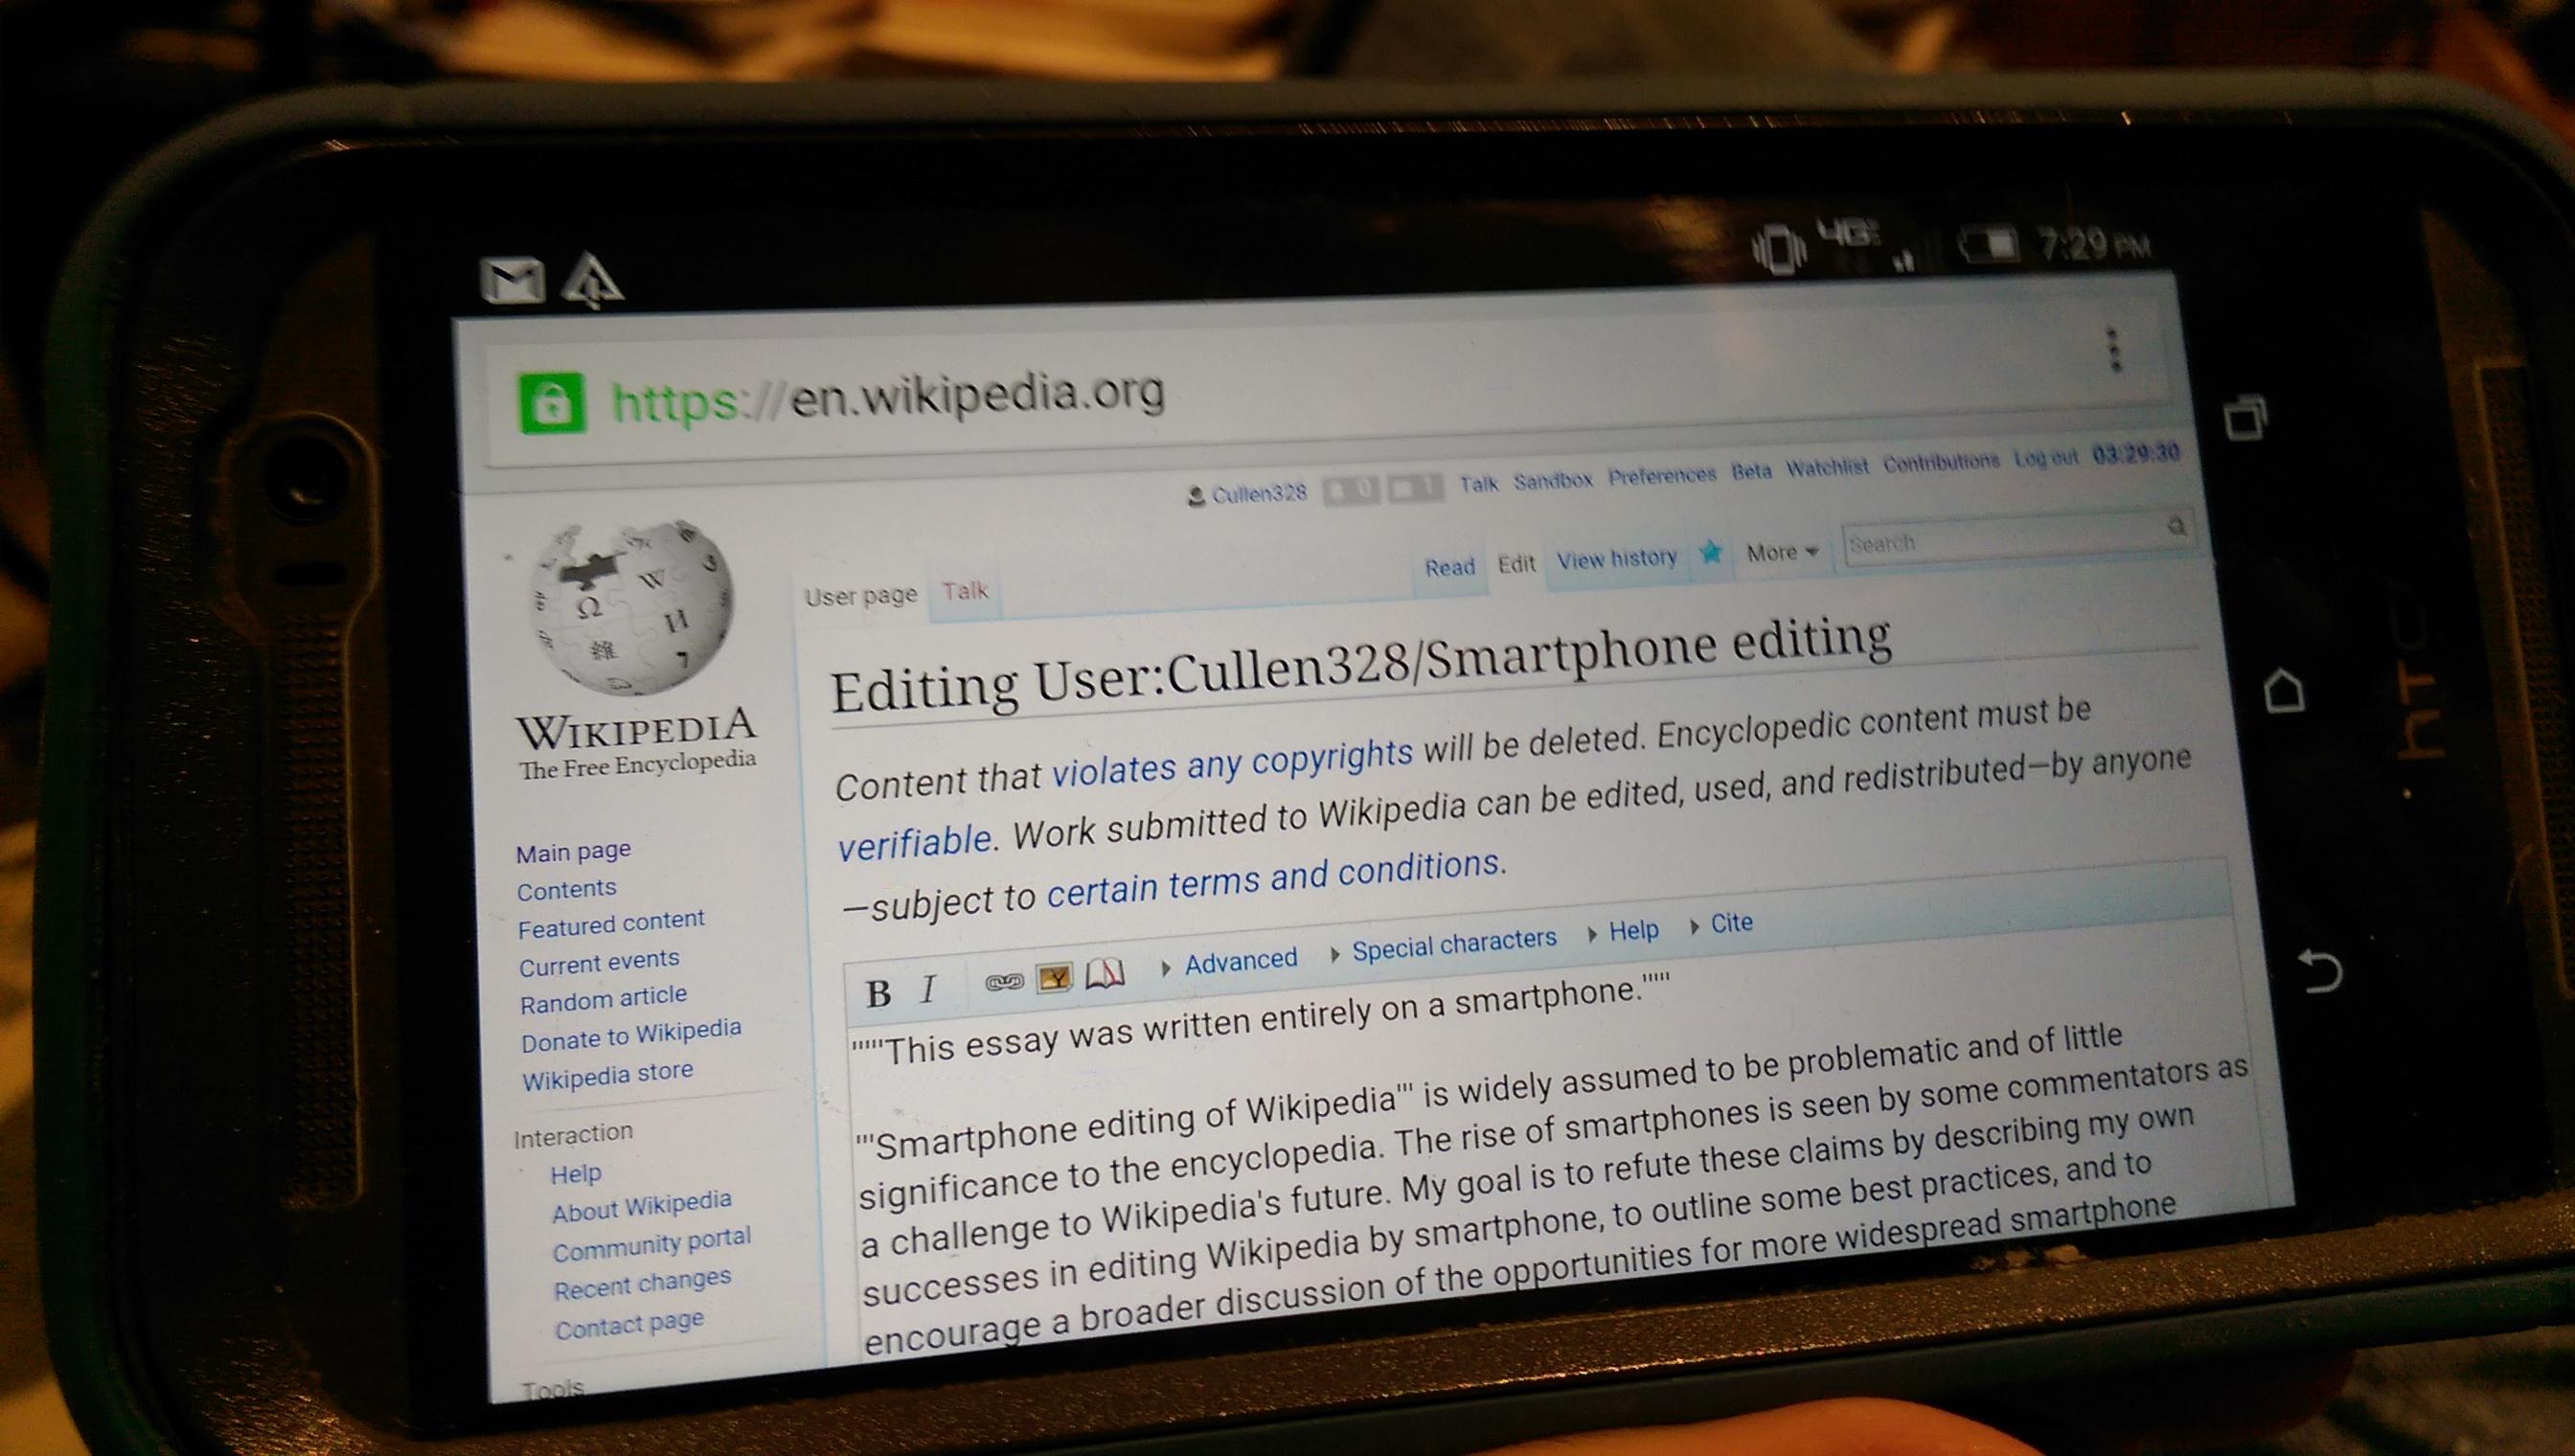 File:2015 Wikipedia smartphone editing 2 jpg - Wikimedia Commons